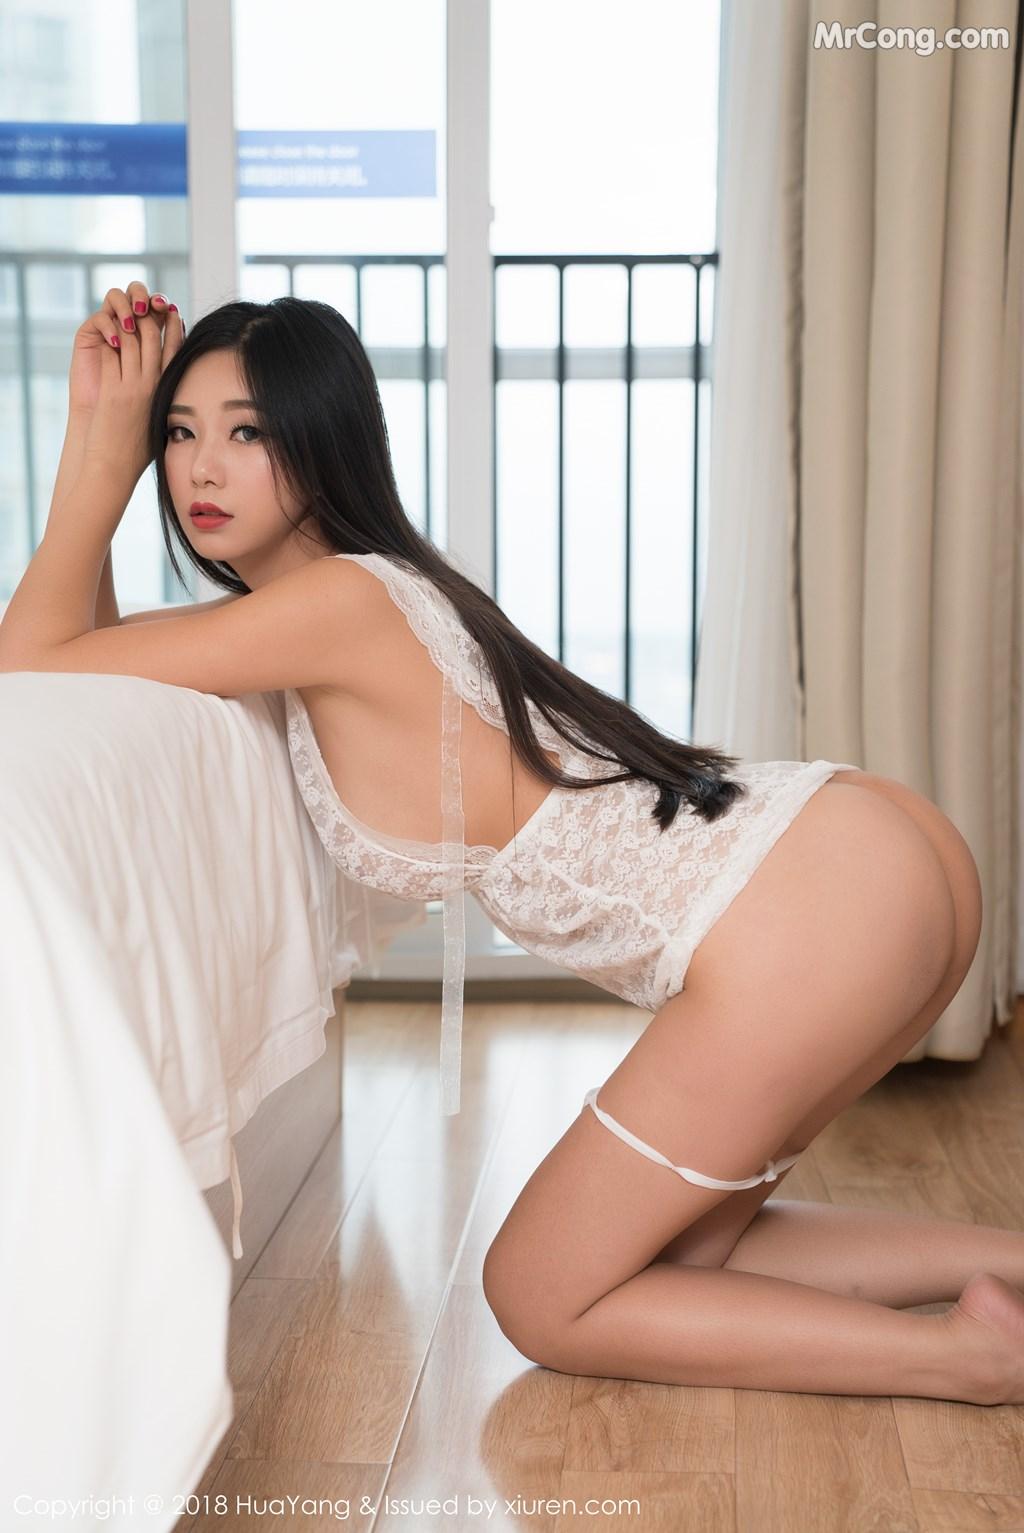 Image HuaYang-2018-02-28-Vol.033-KiKi-MrCong.com-026 in post HuaYang 2018-02-28 Vol.033: Người mẫu 宋-KiKi (42 ảnh)